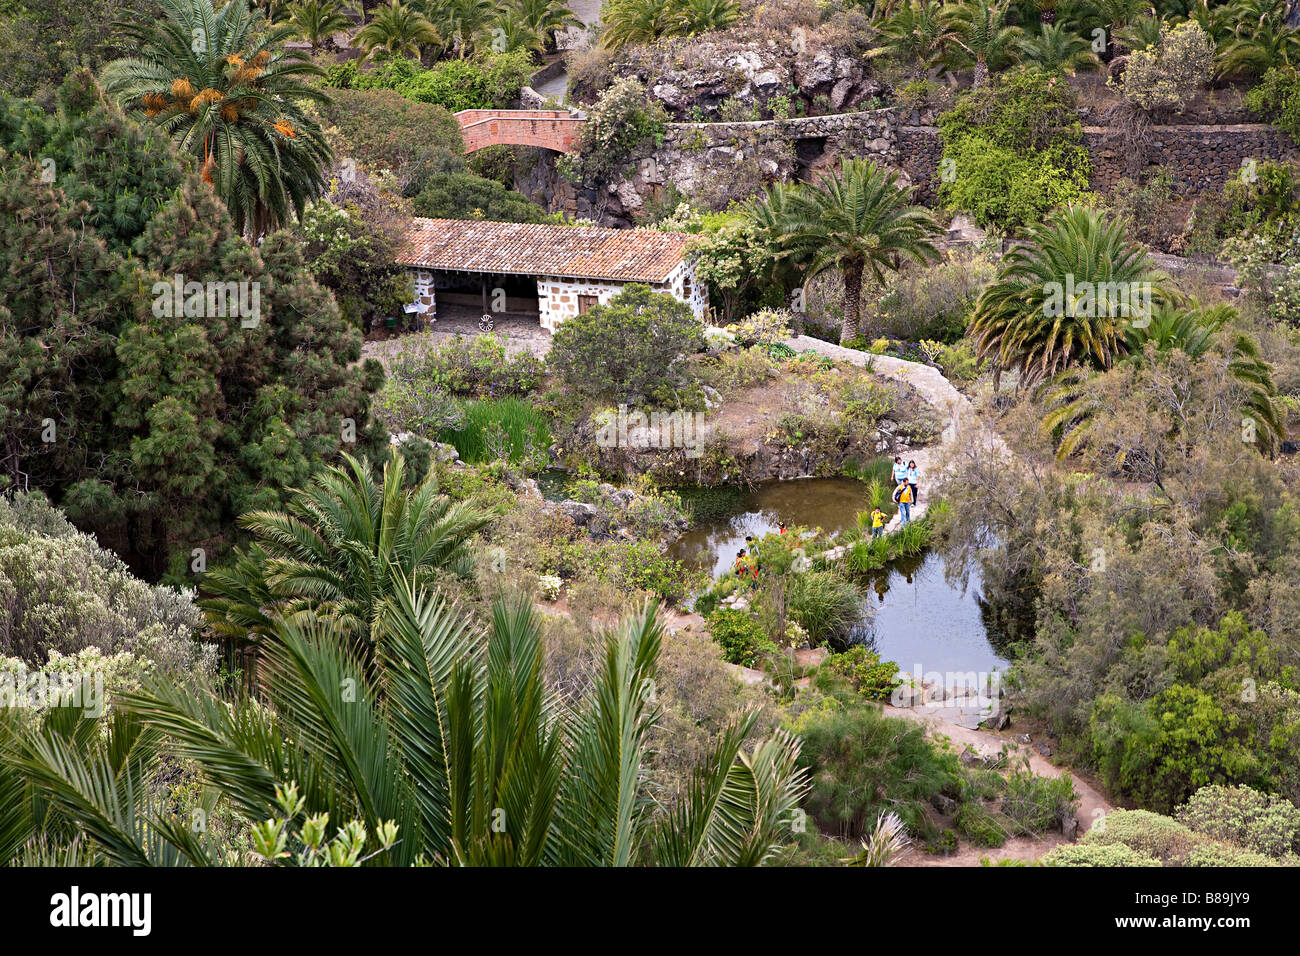 People walking on paths through the jardin canario for Jardin canario horario